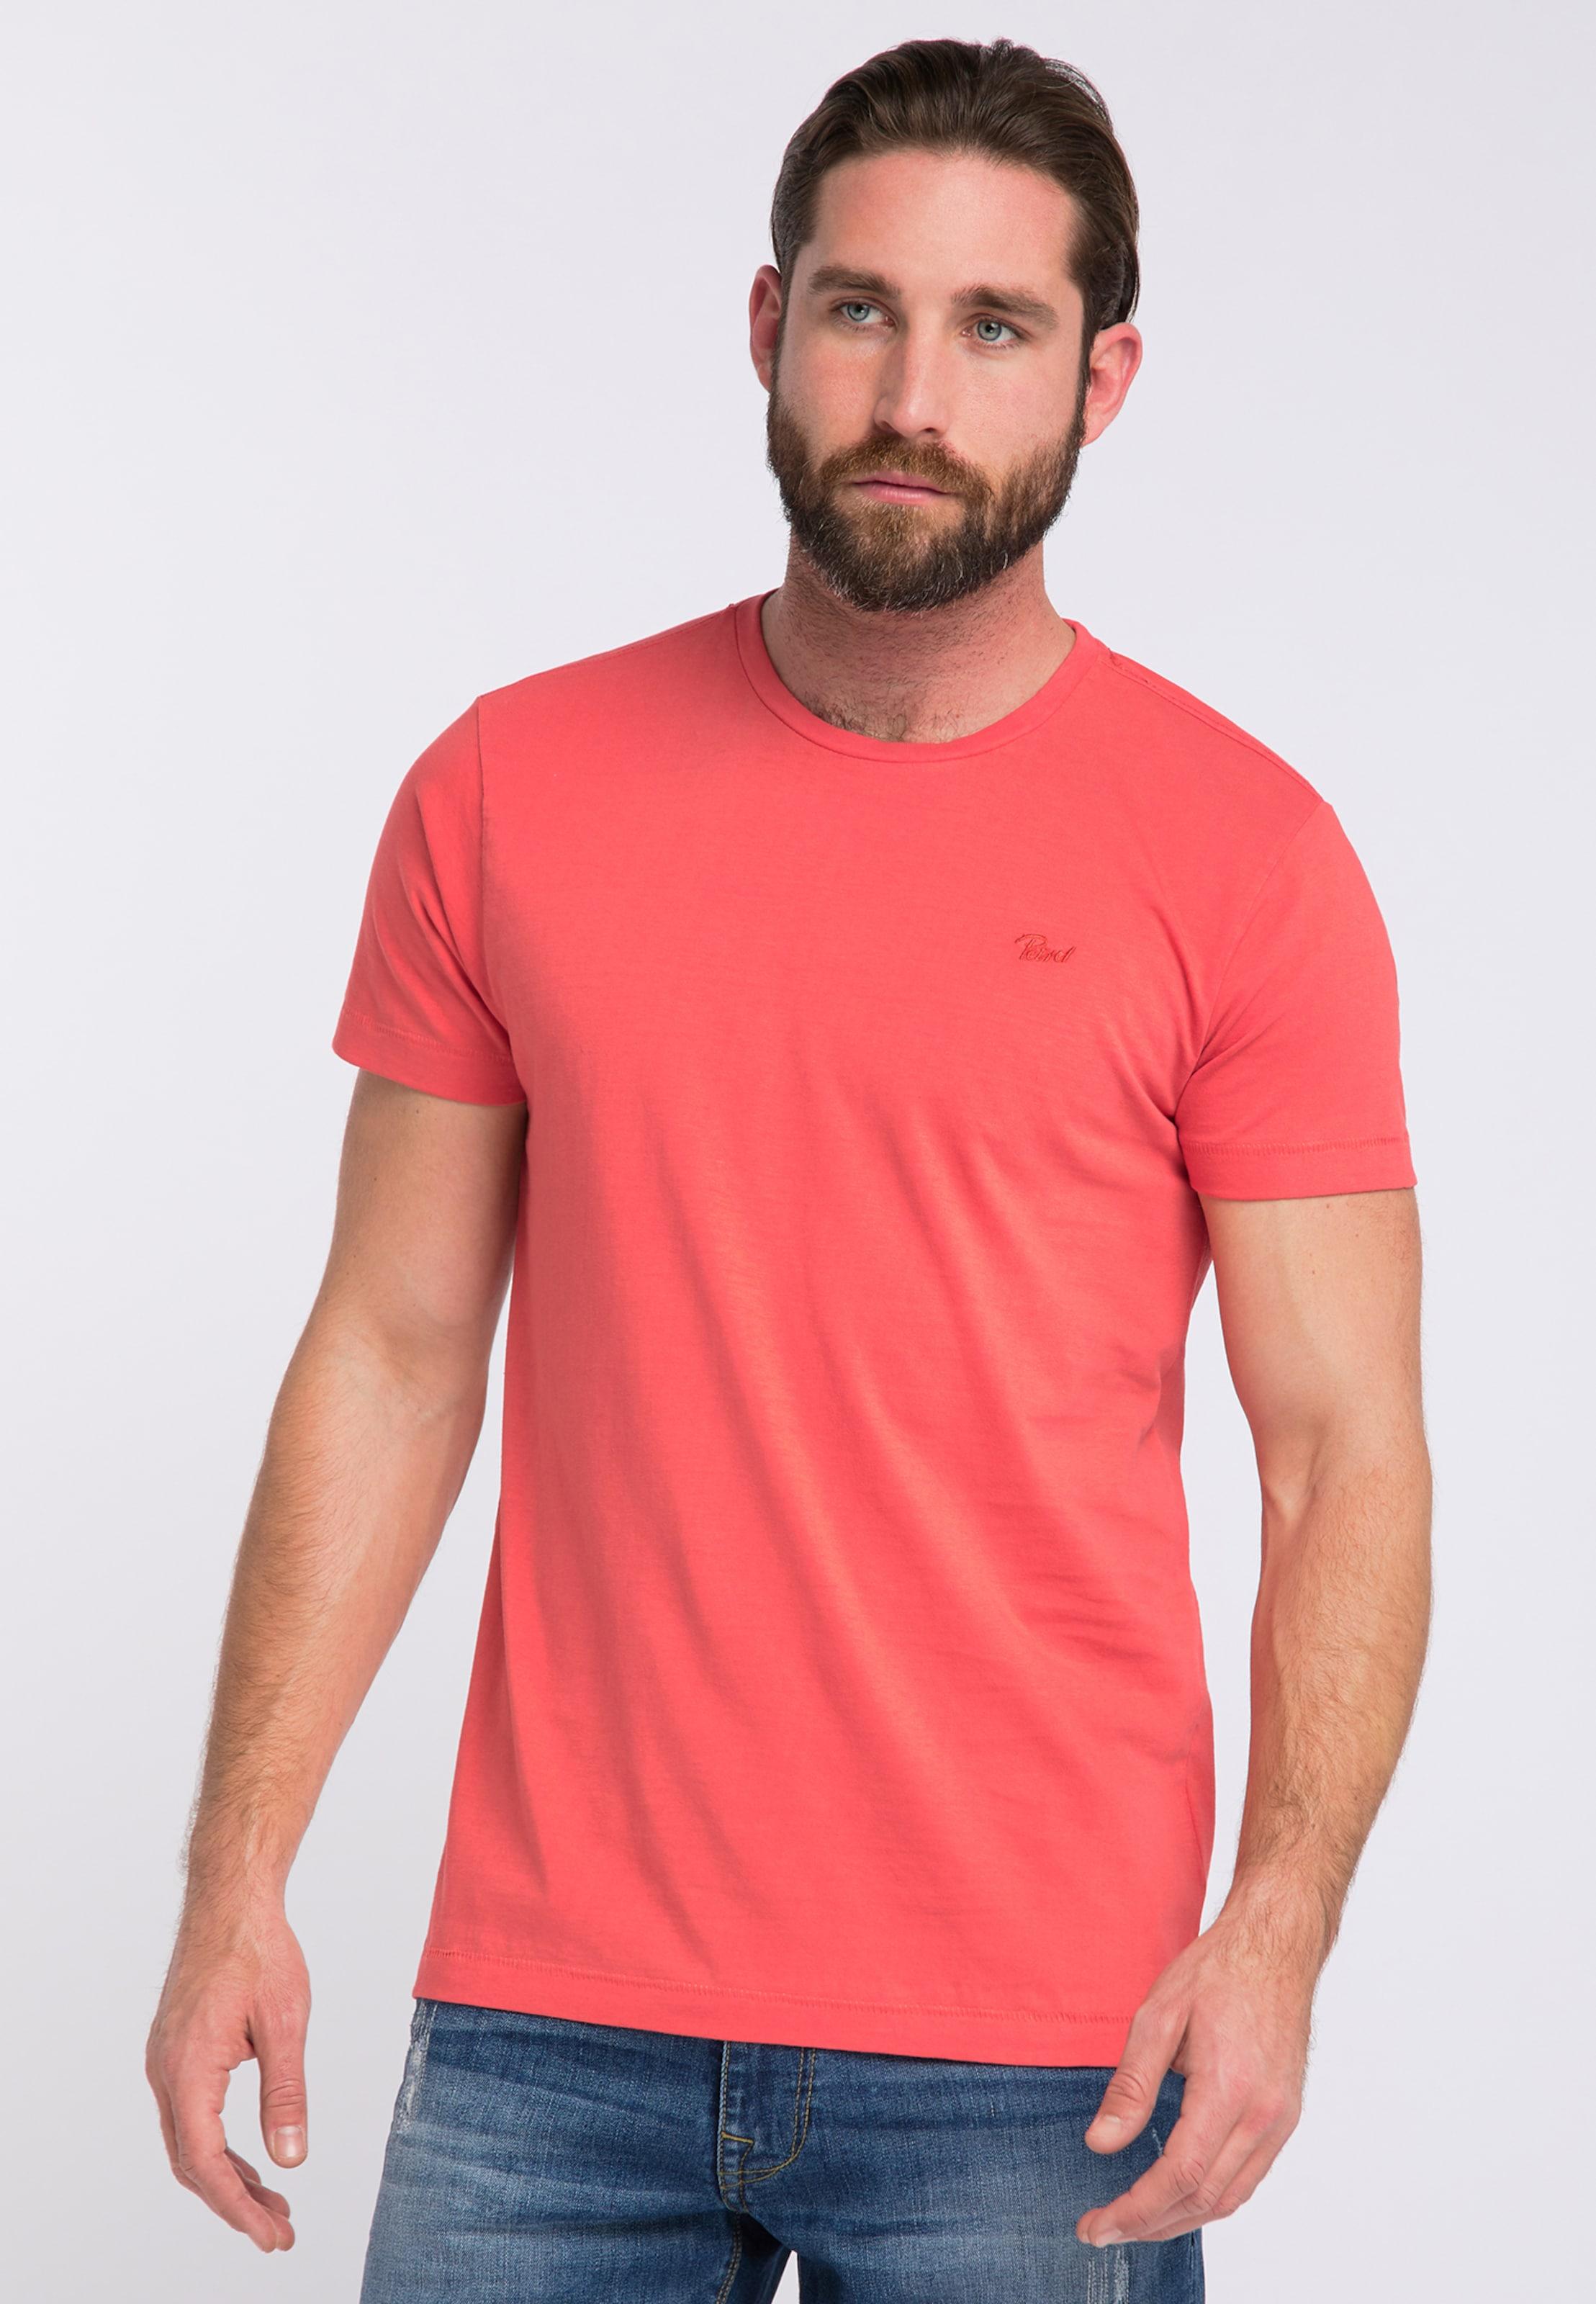 Rot Industries In shirt T Petrol ZuwOkPiXT